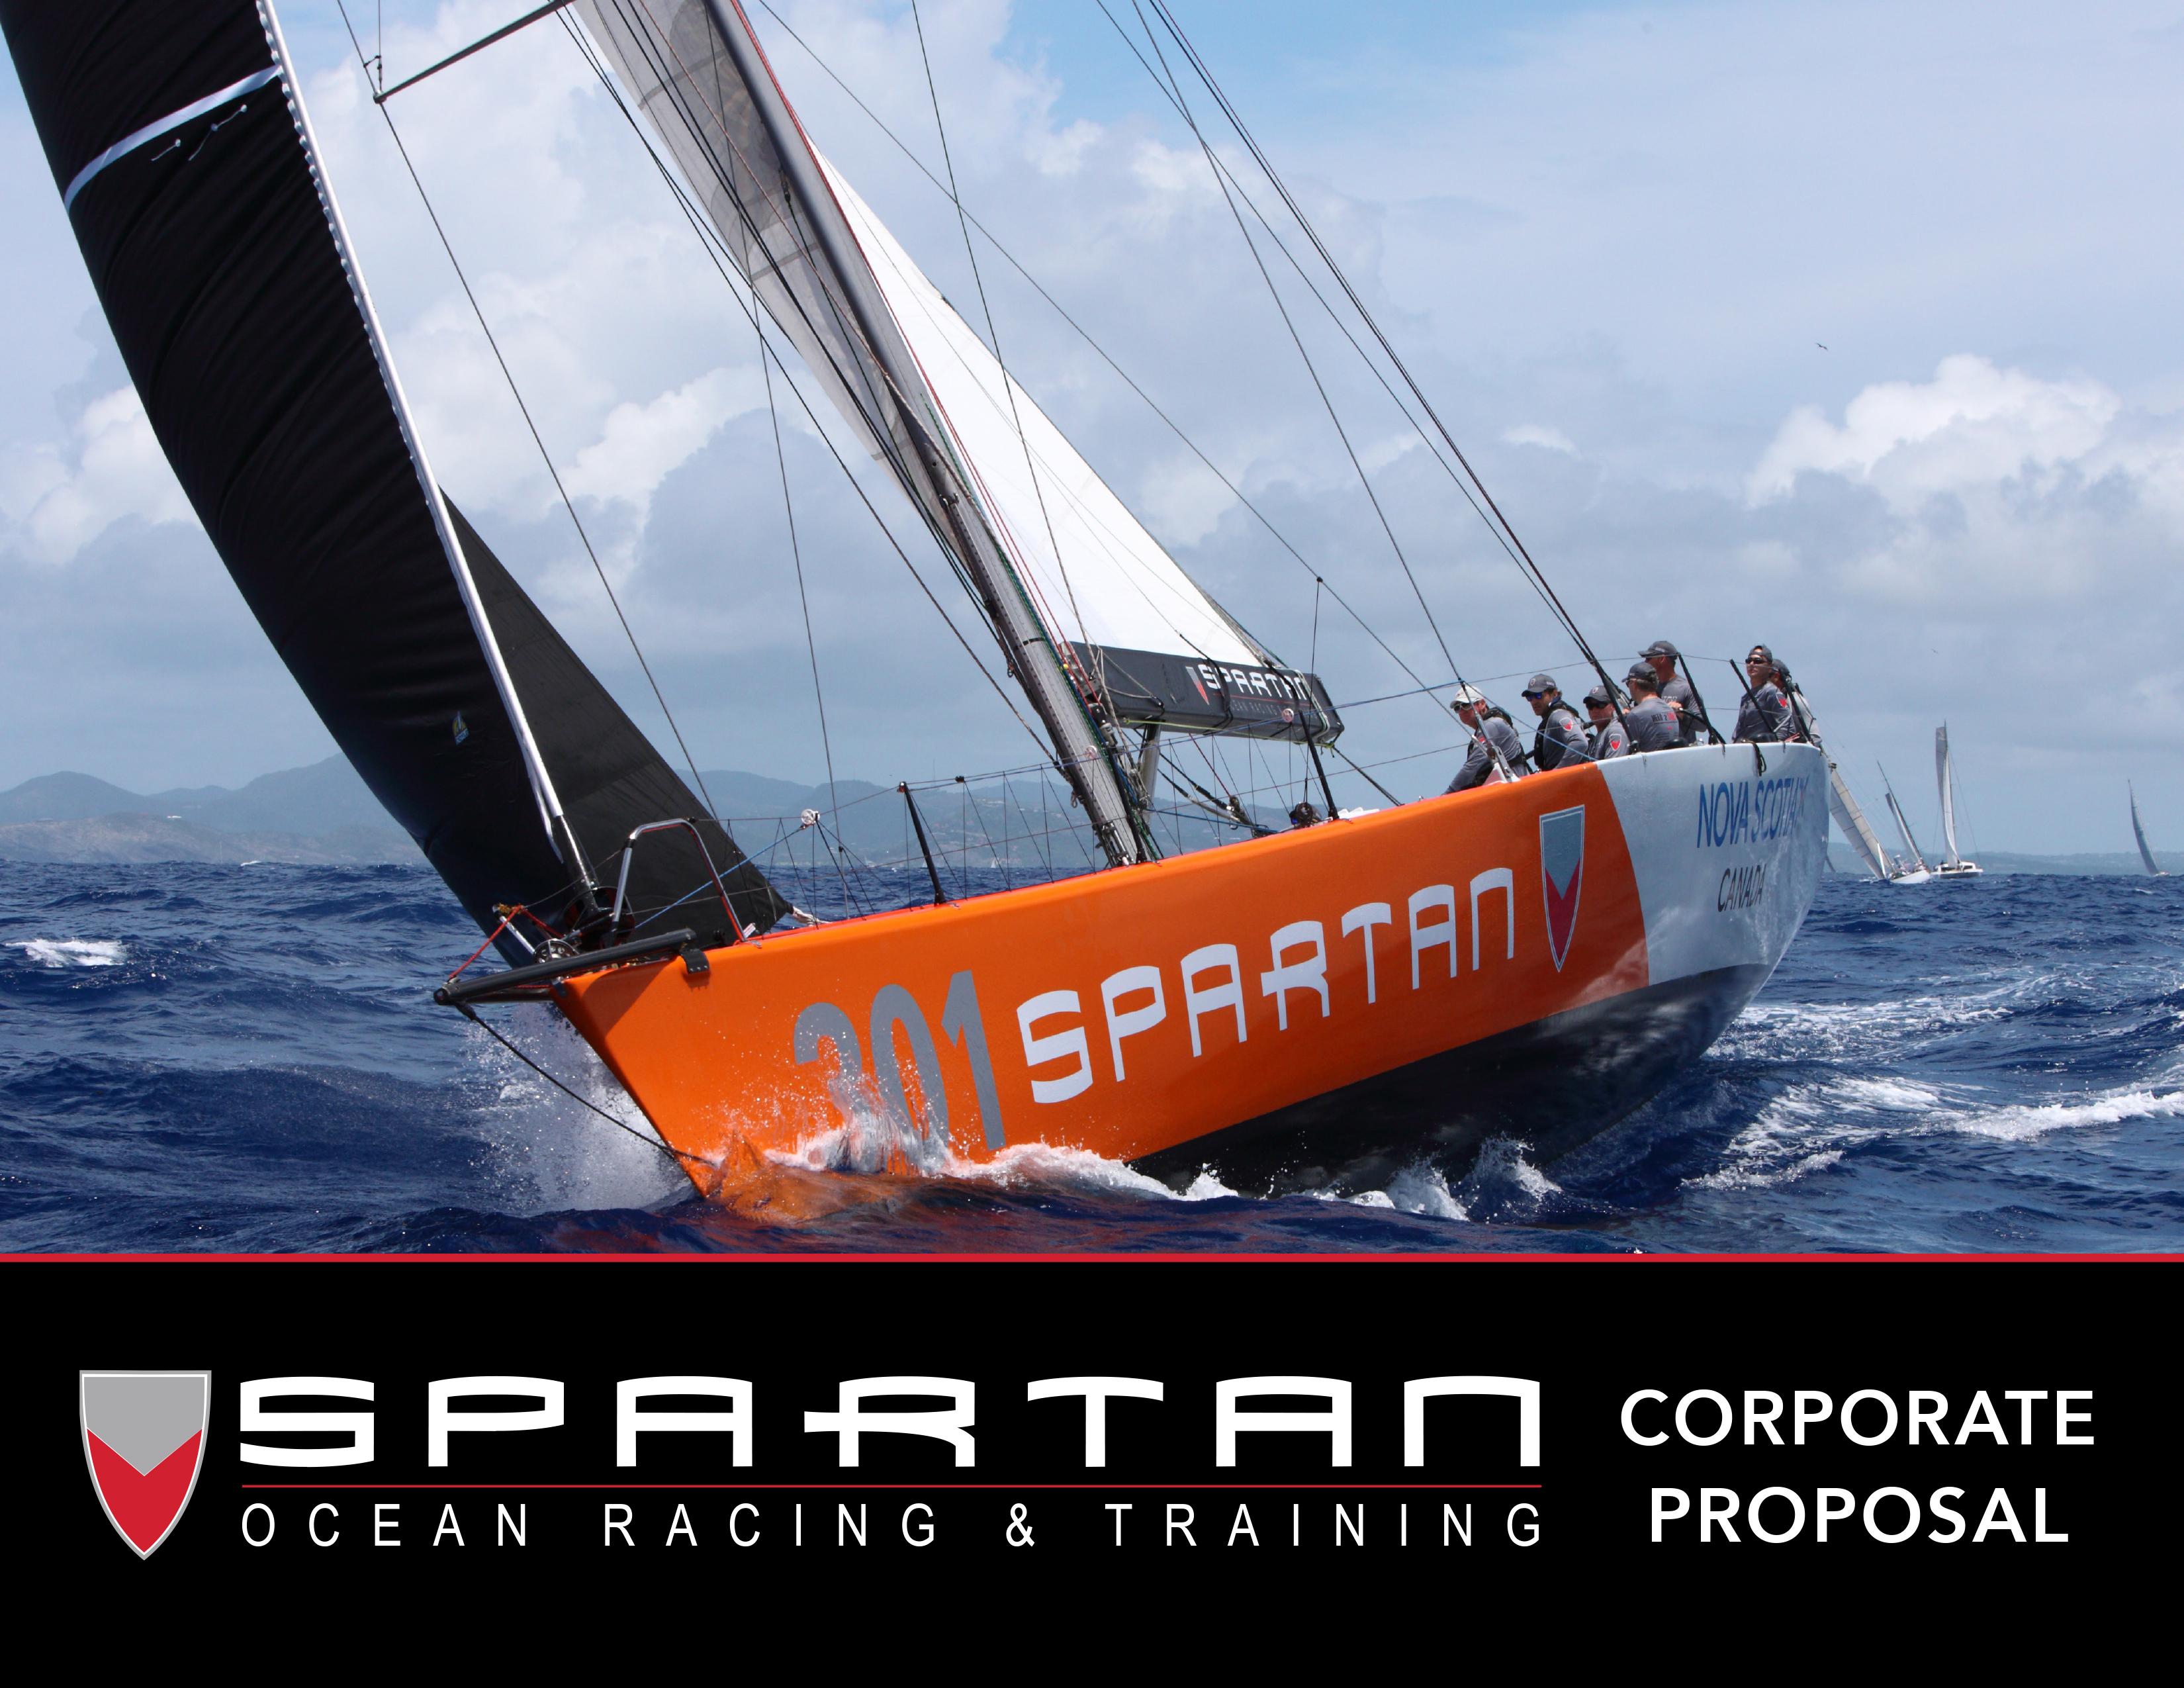 Spartan Investor Proposal